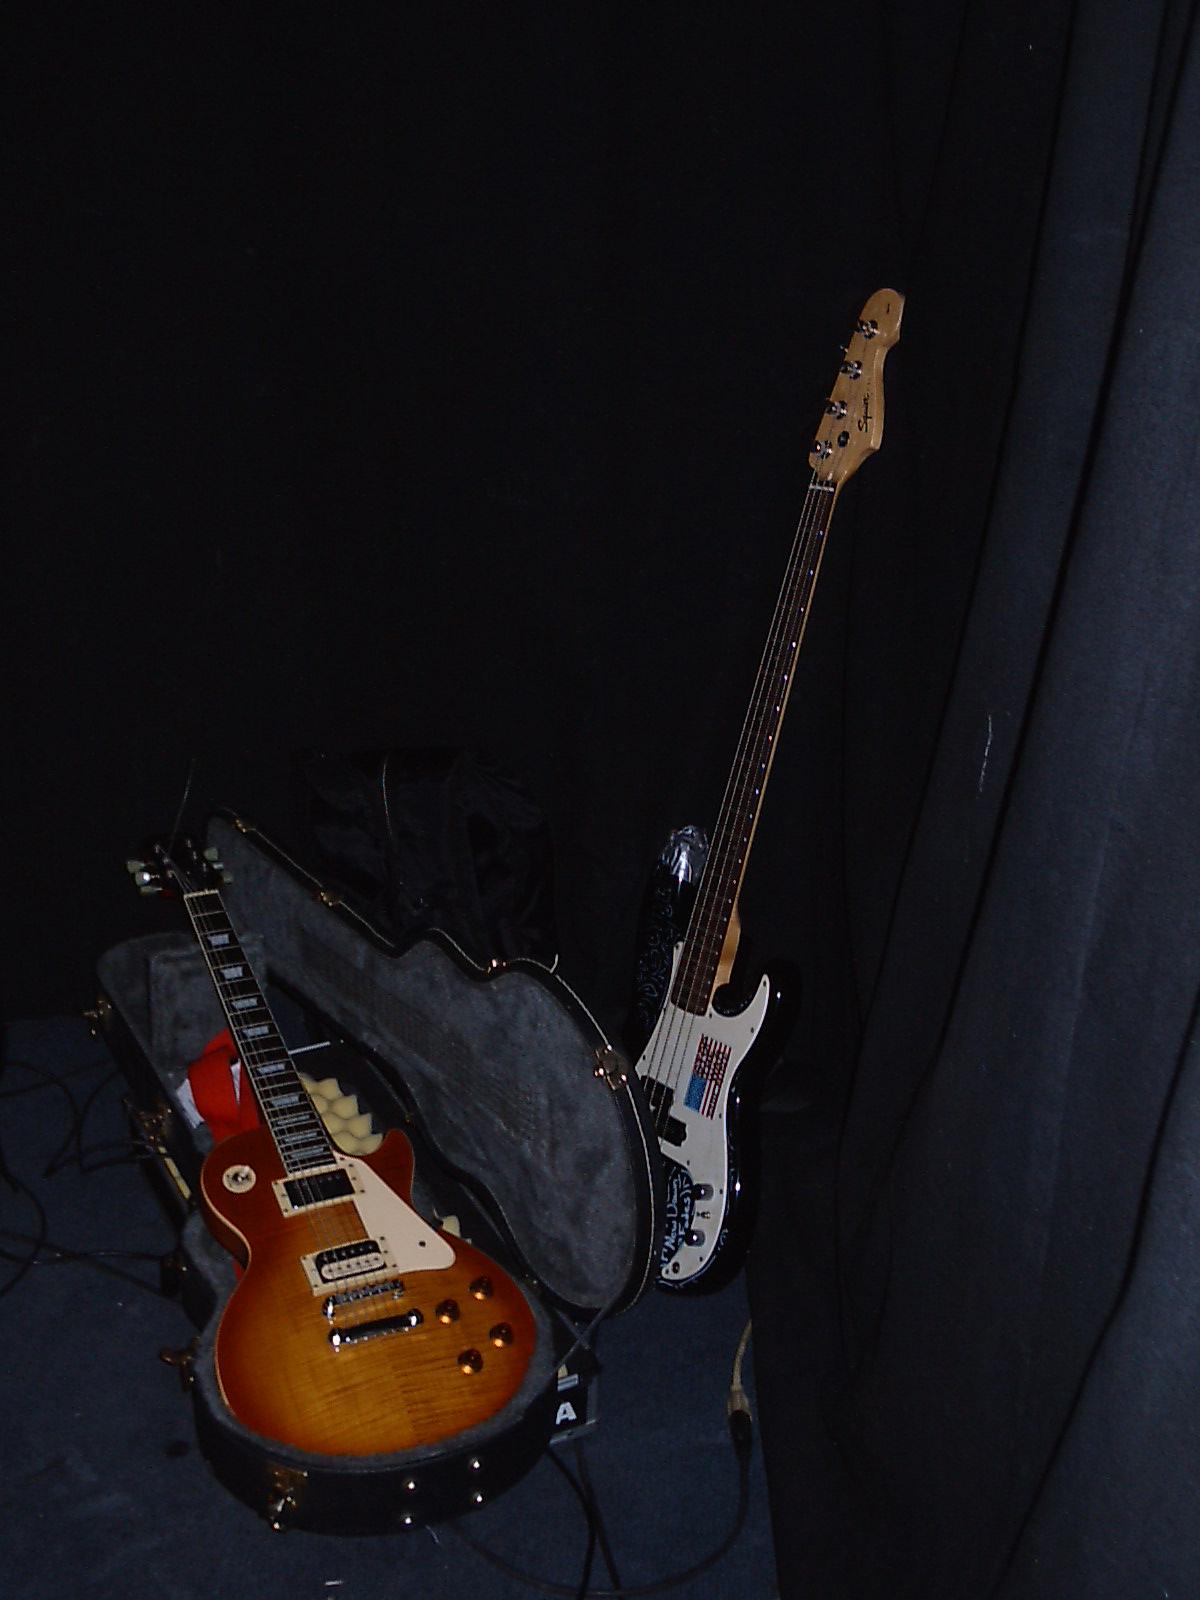 BLACK CAT - Guitars.jpg